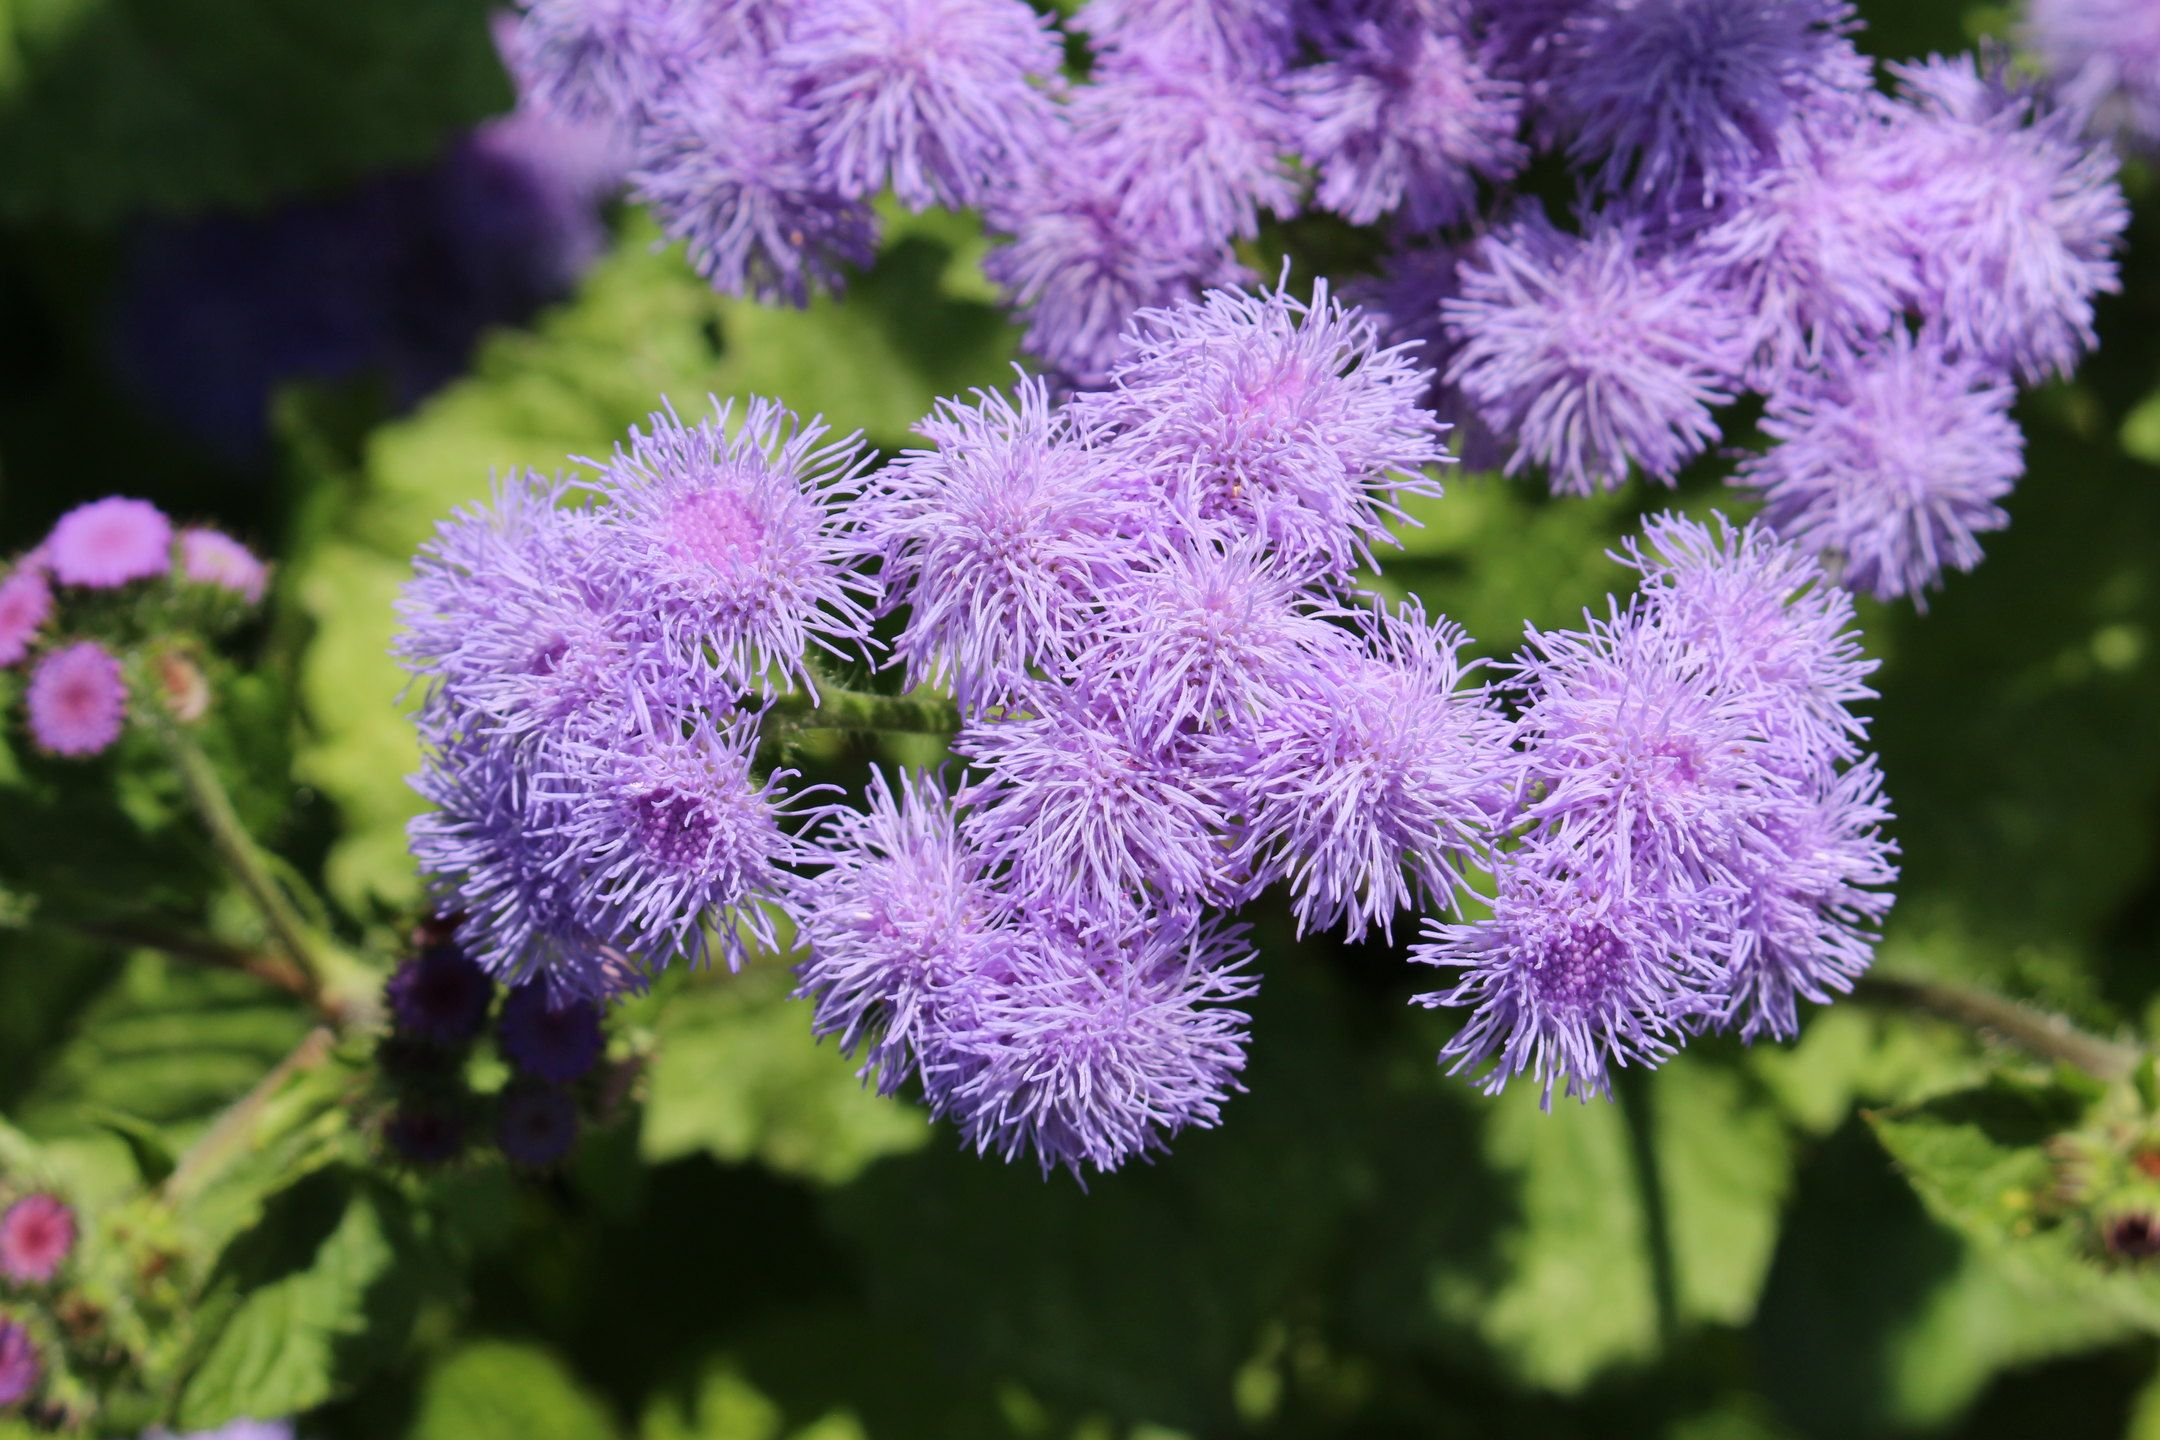 Bluemink Garden Blooming Floss Flowers In 2020 Annual Flowers Flower Seeds Organic Plants